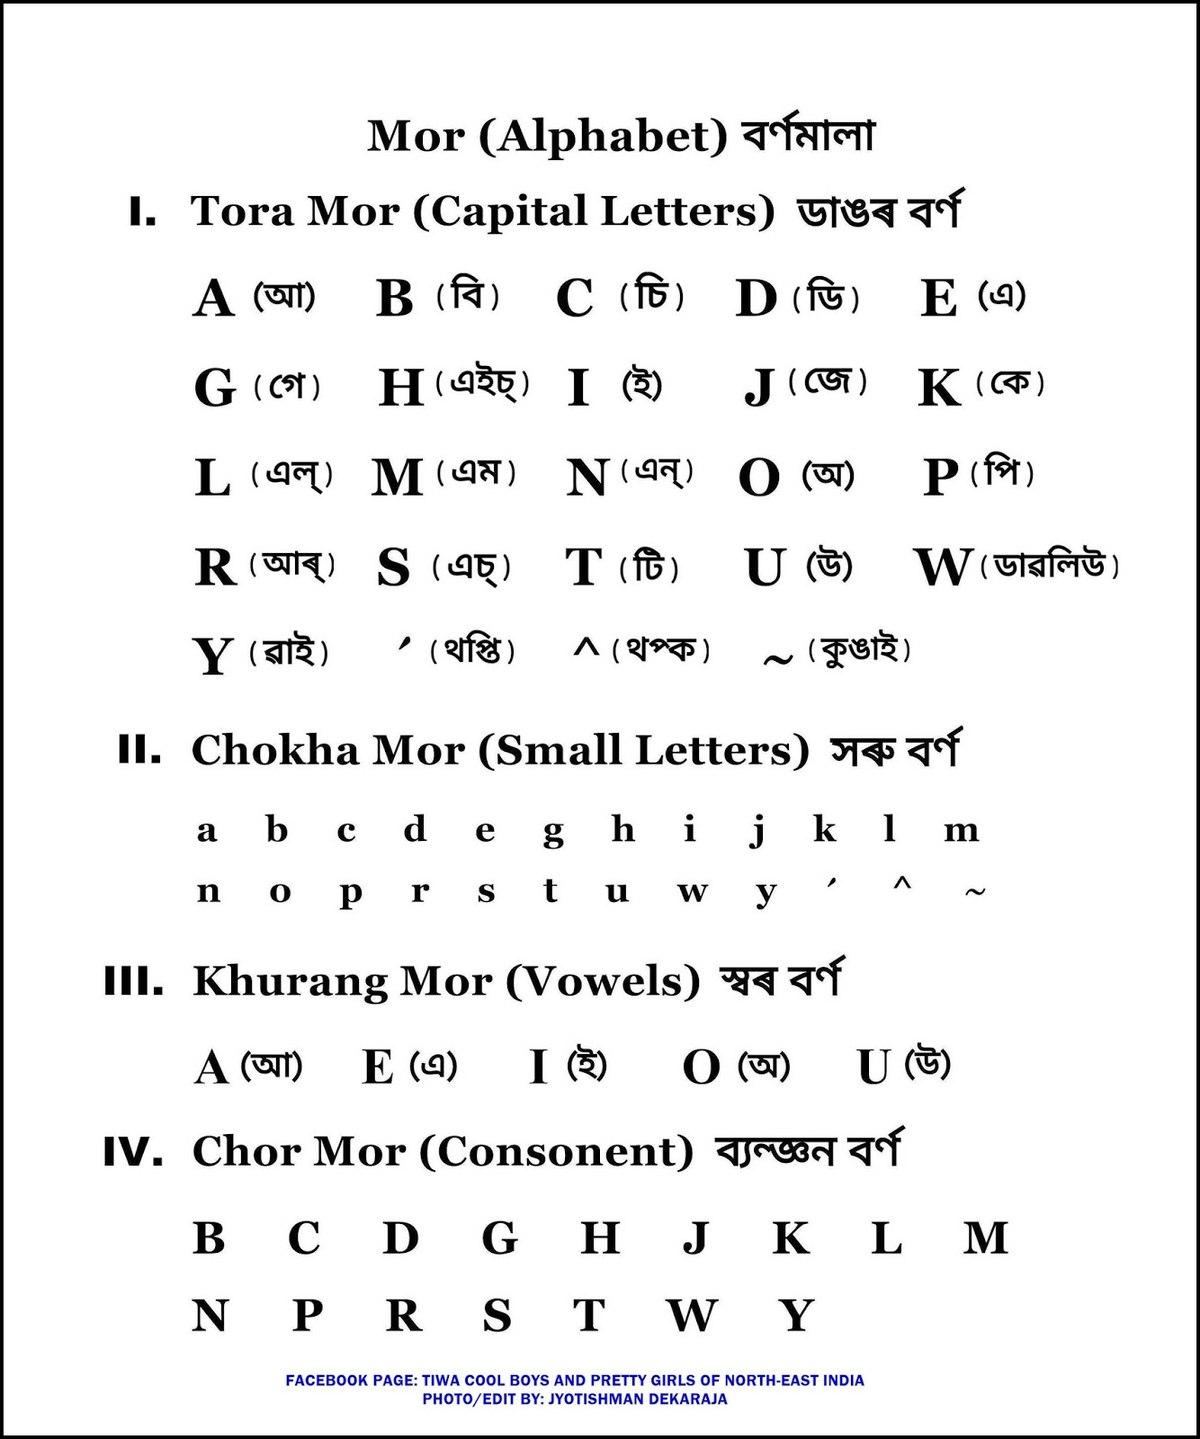 tiwa language india wikipedia